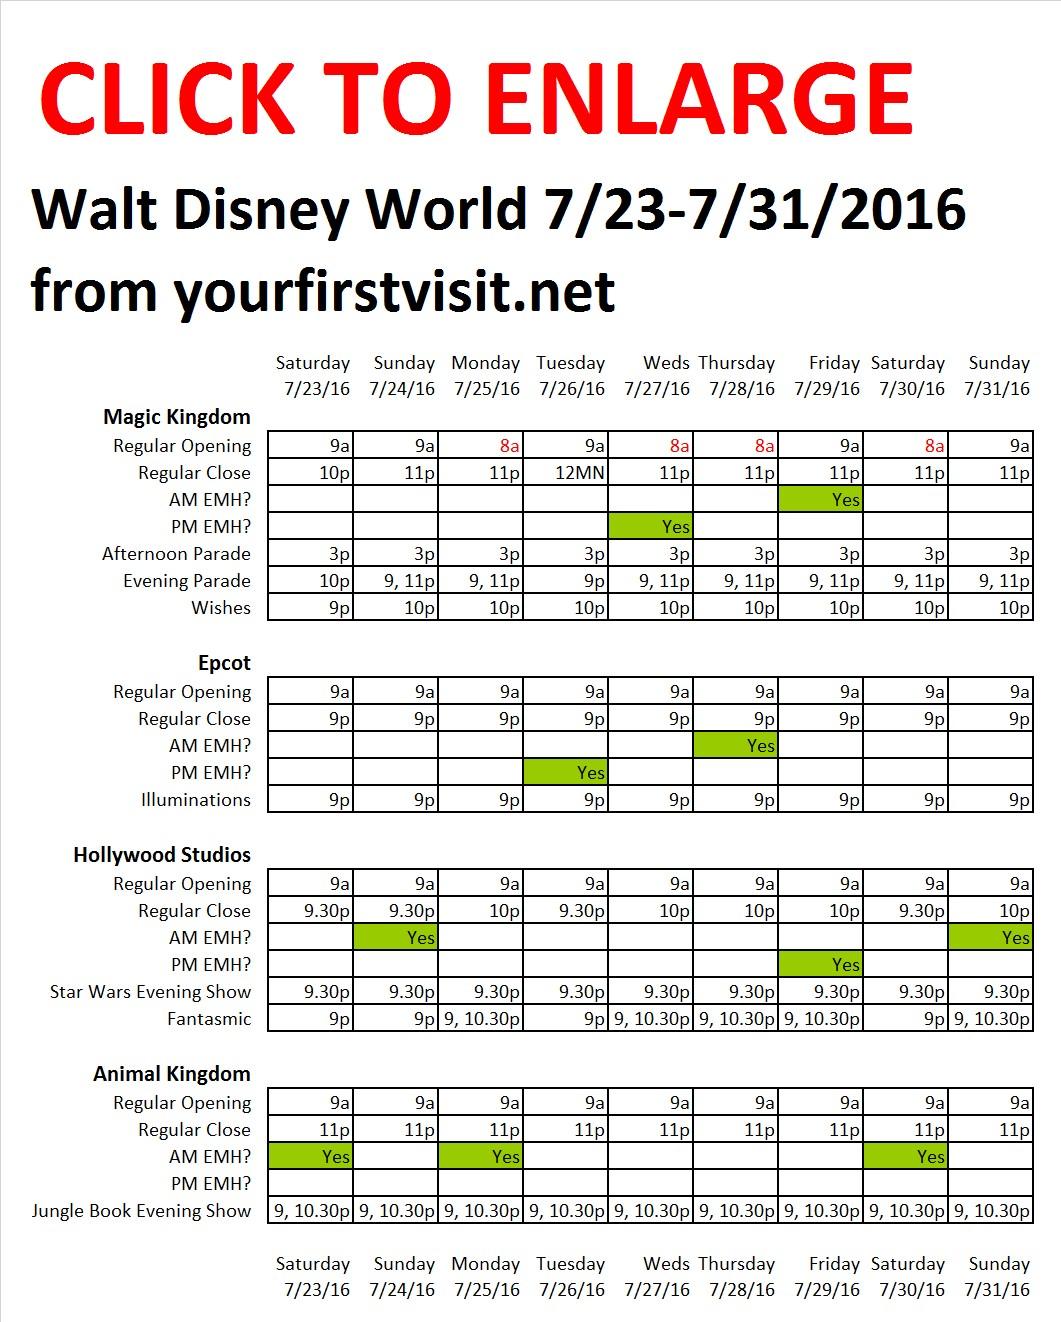 Disney World 7-23 to 7-31-2016 from yourfirstvisit.net